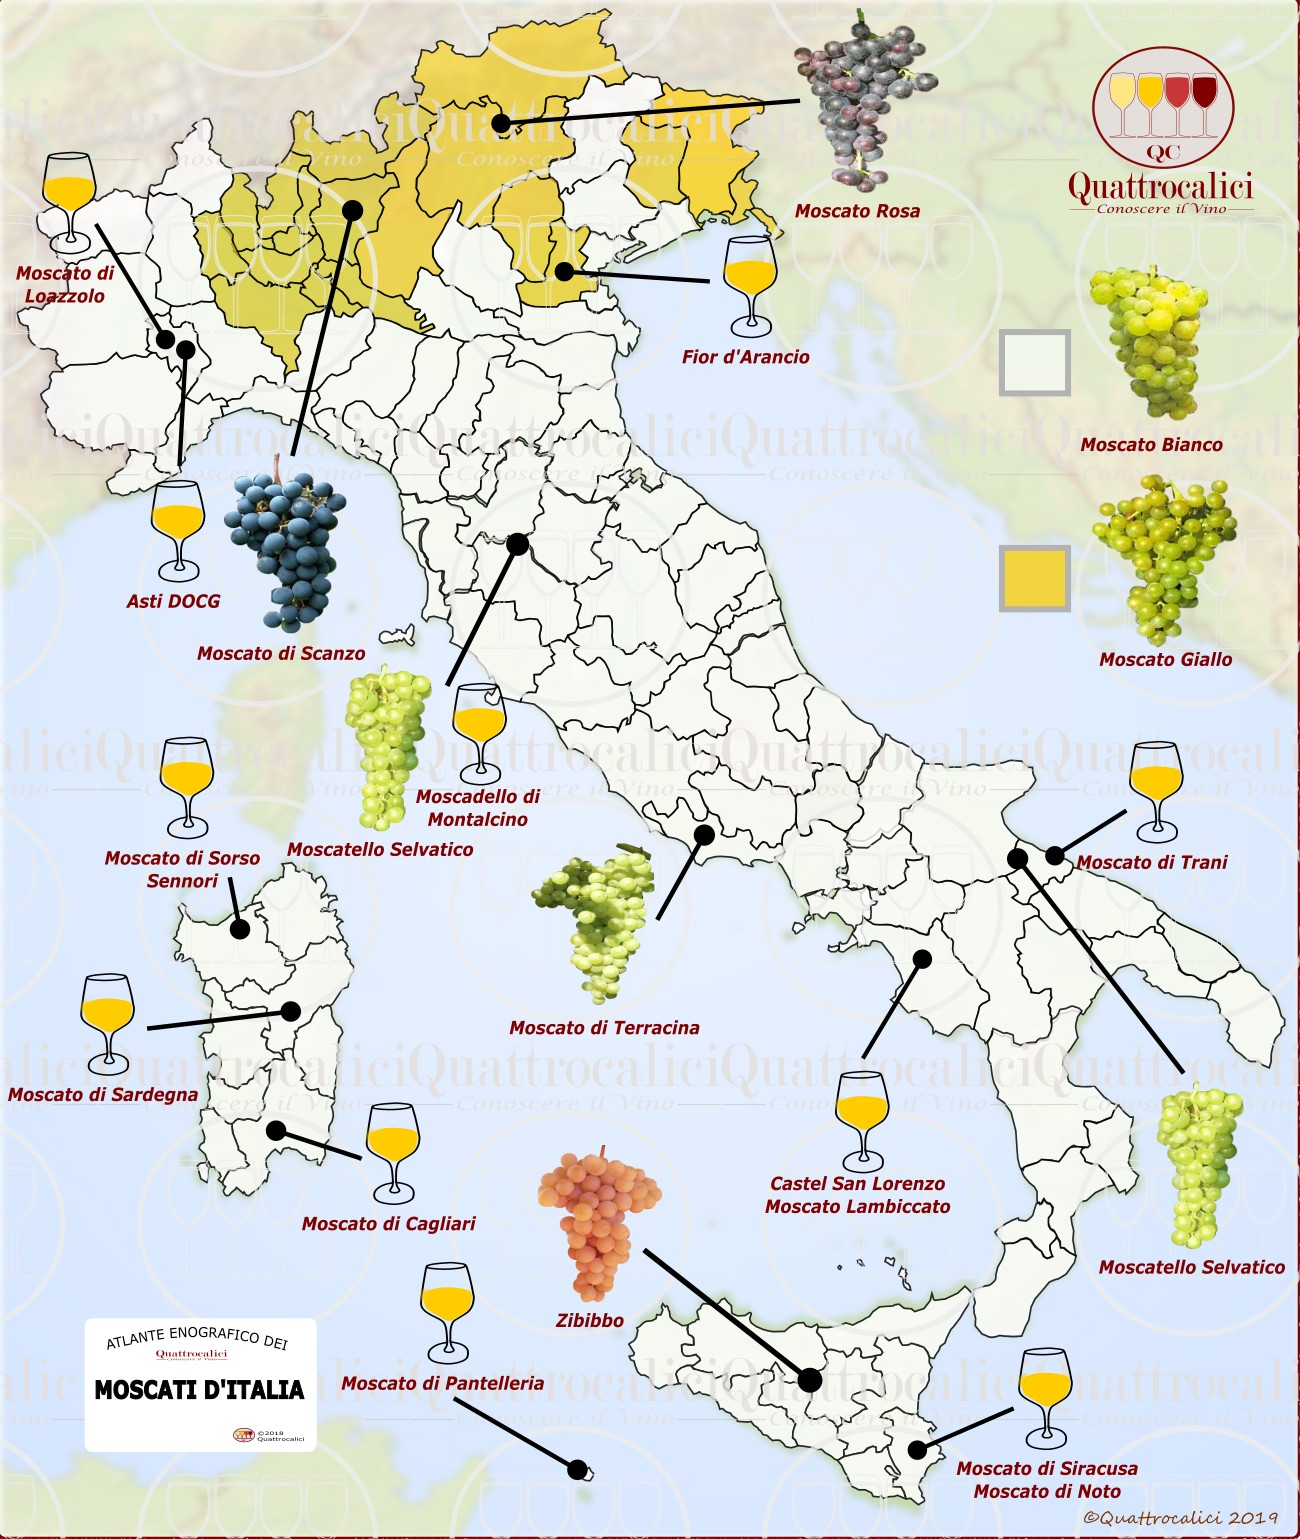 Moscato - Cartina dei Moscati d'Italia